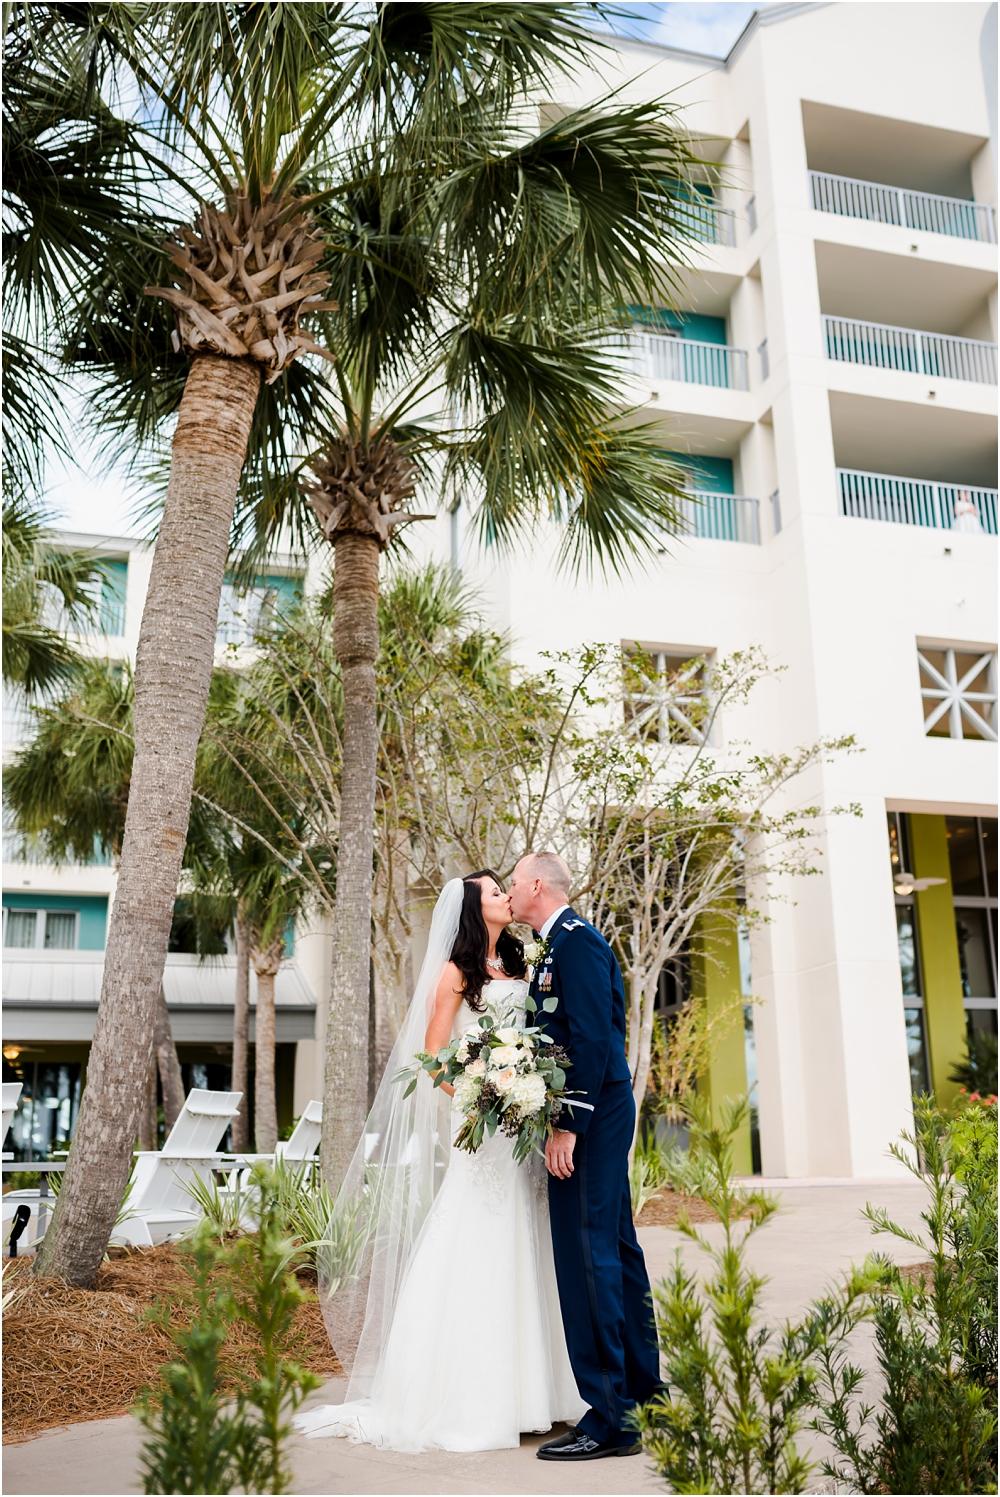 quinn-bay-point-sheraton-florida-wedding-photographer-kiersten-grant-55.jpg